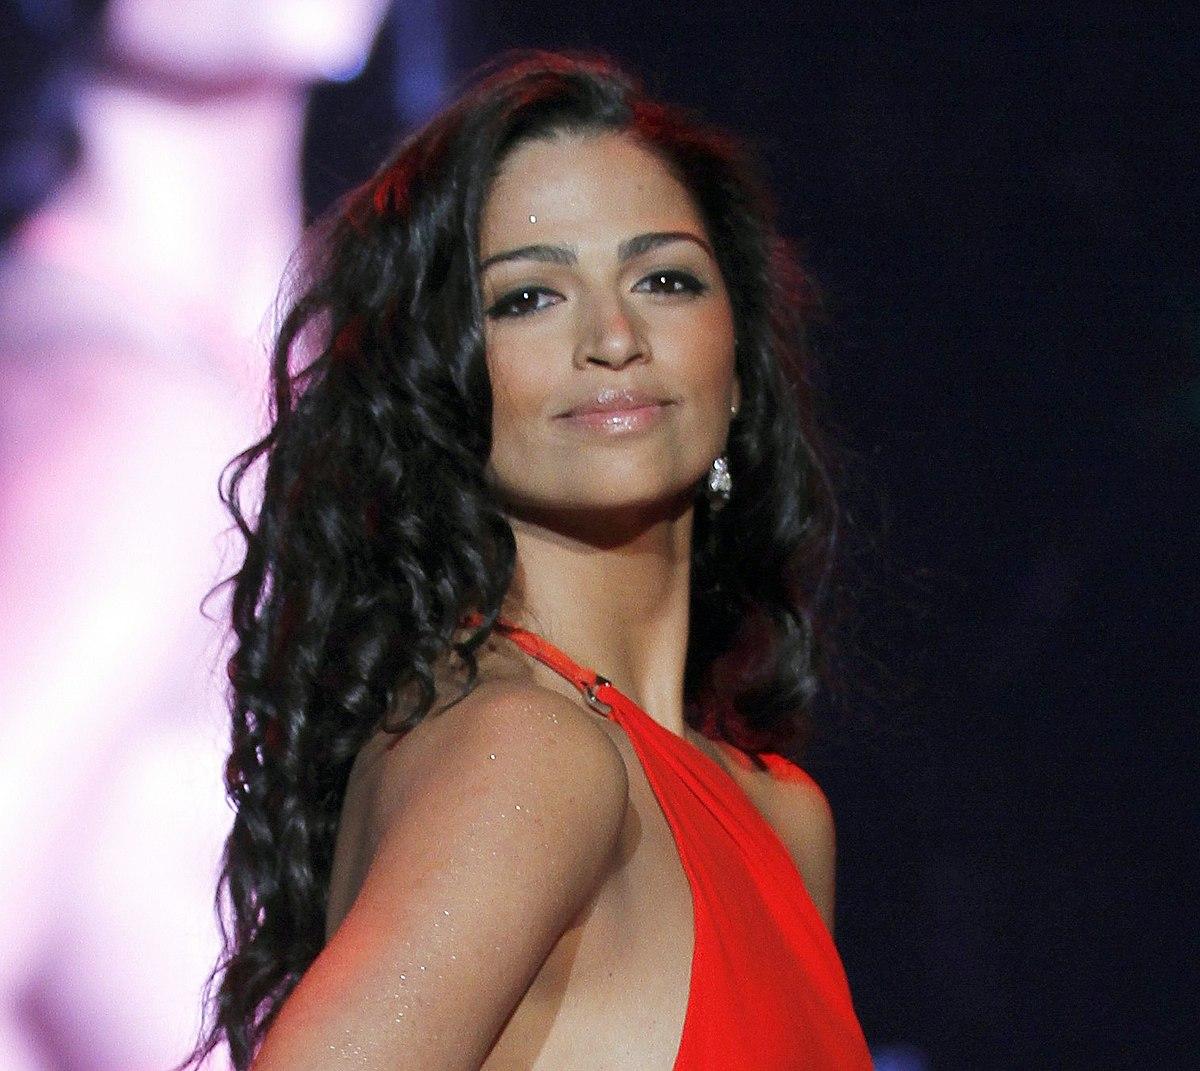 Camila Alves Net Worth